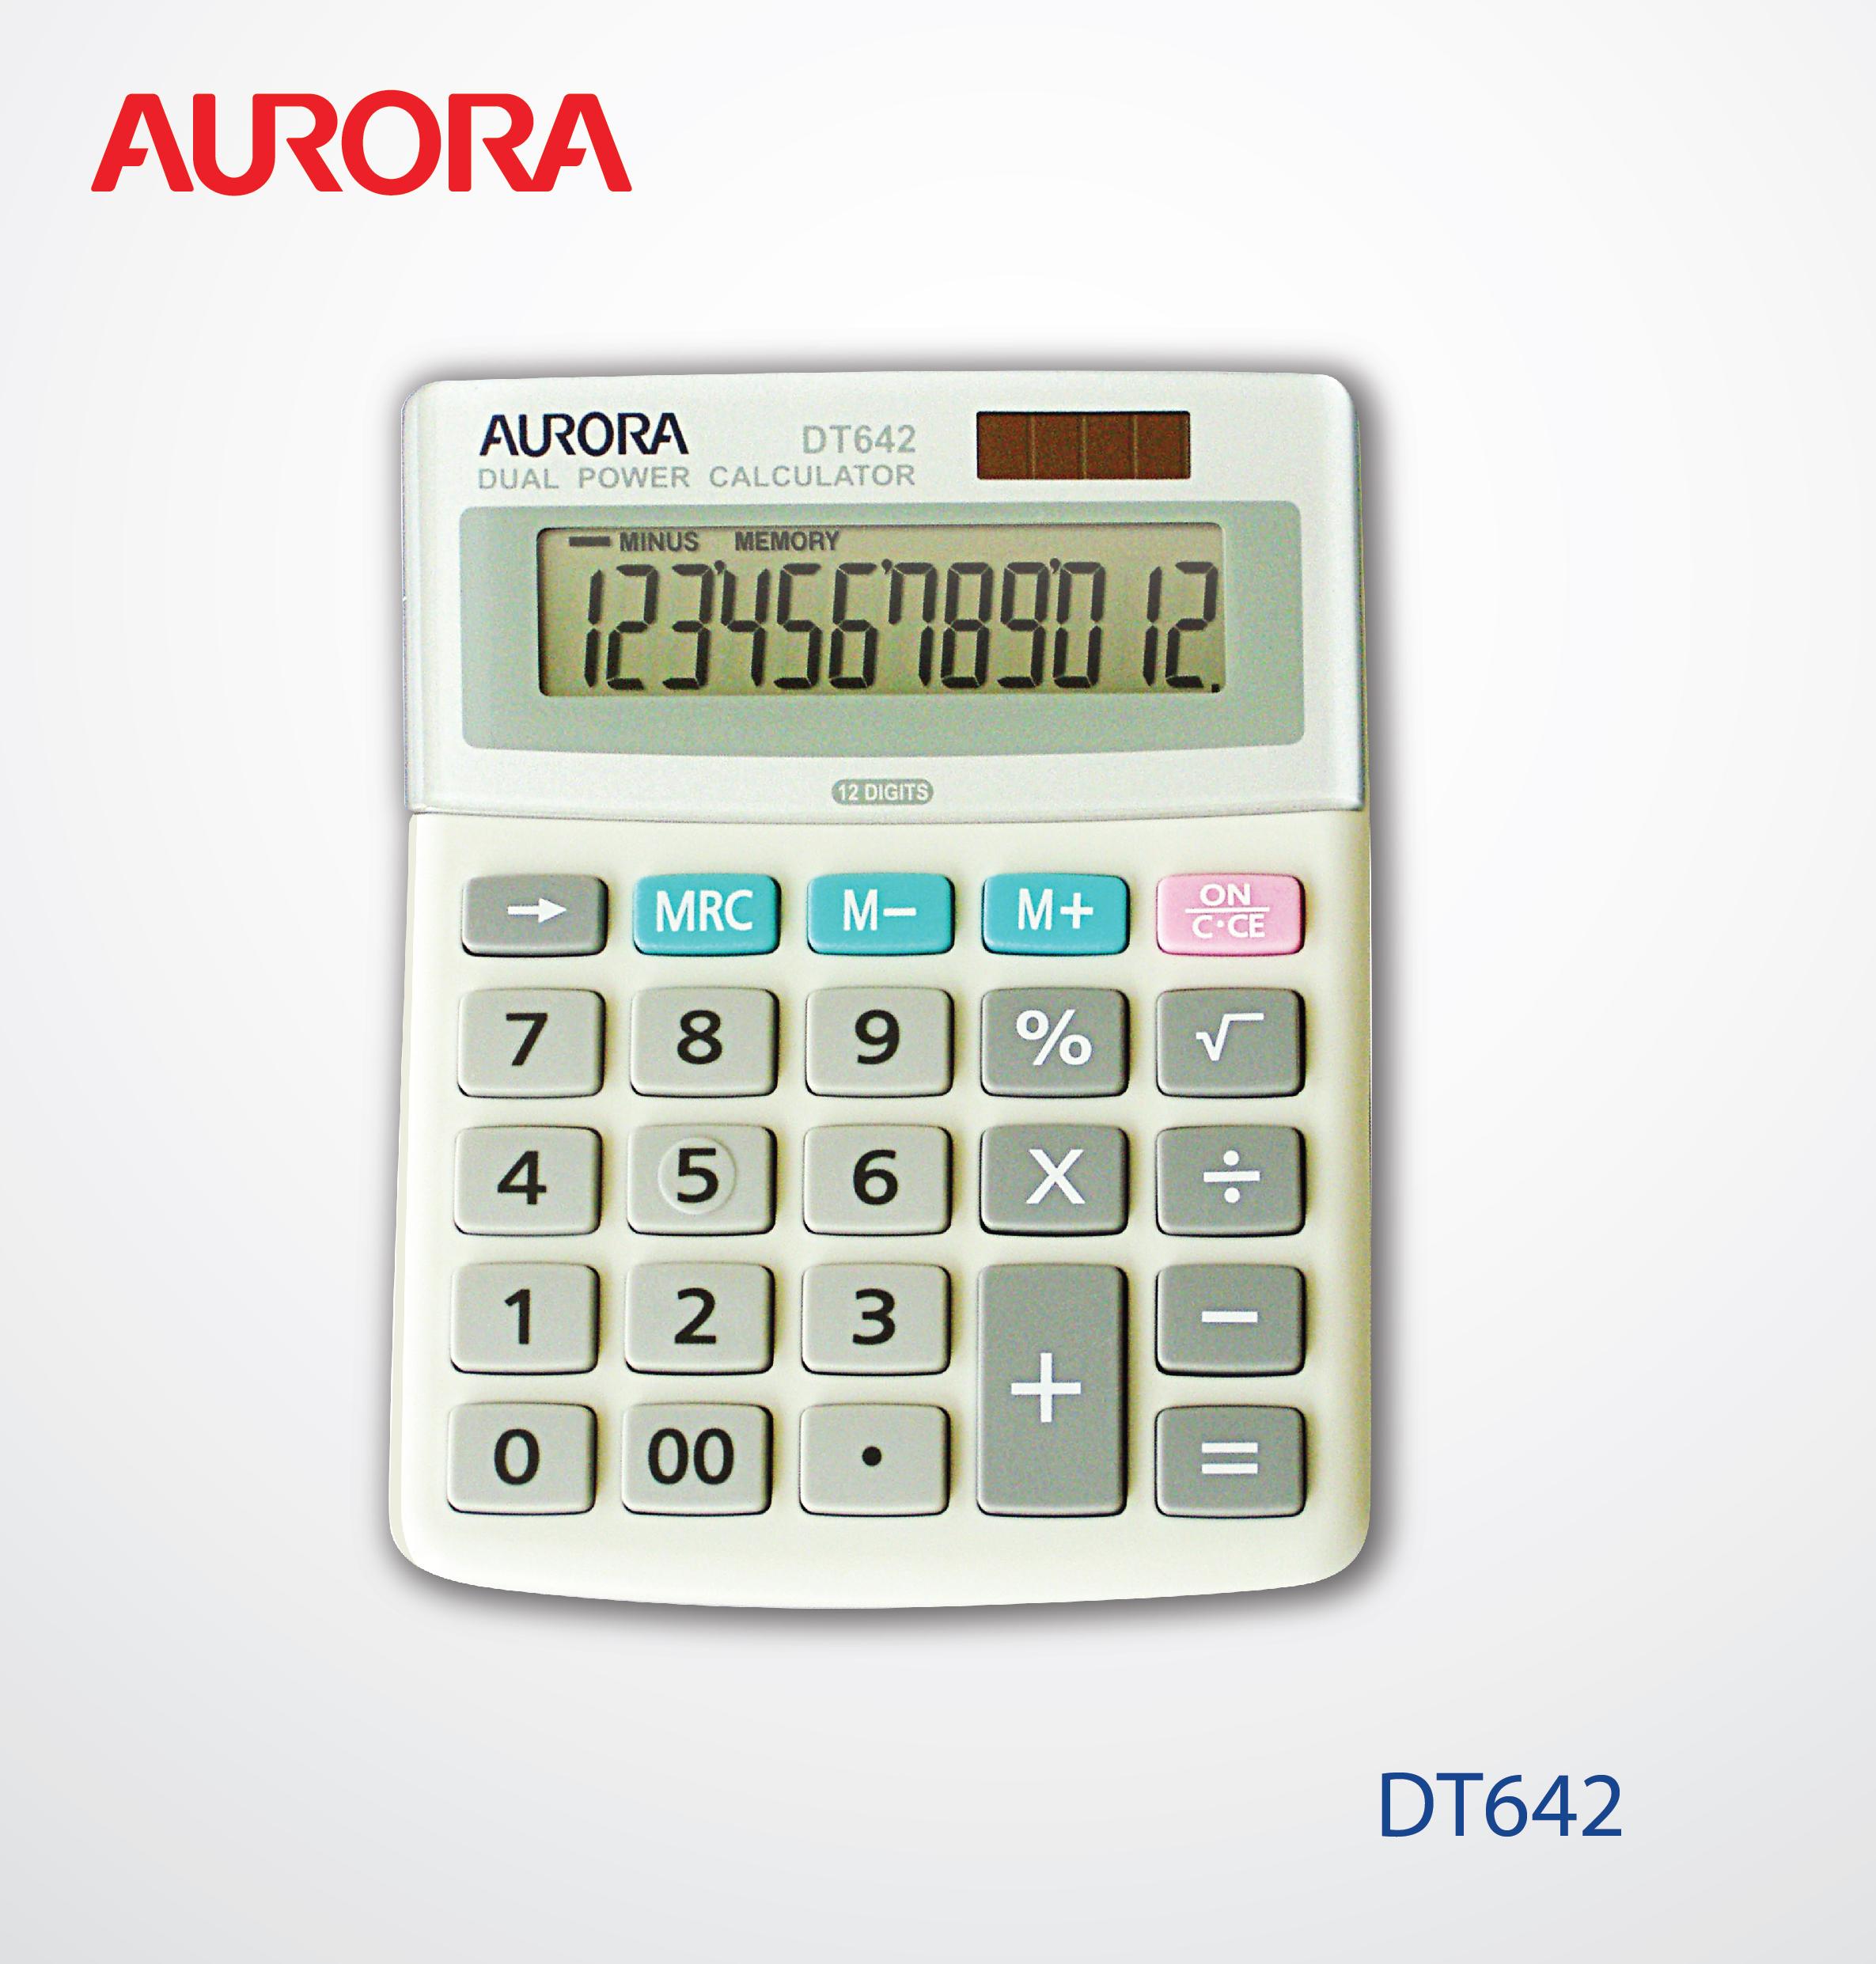 Aurora Calculator_DT642 copy